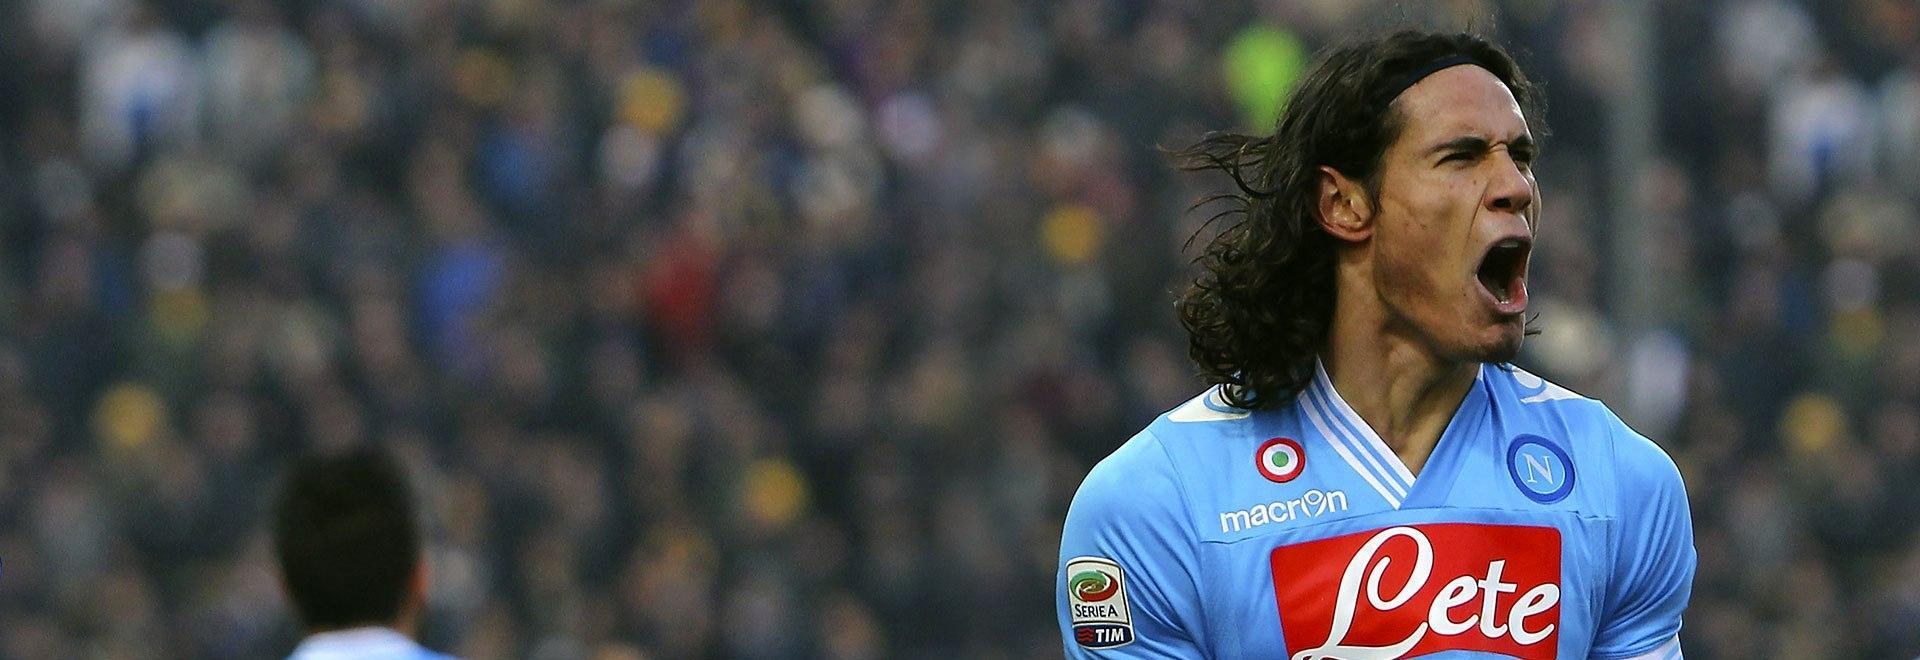 Cavani 100 gol e Oltre in Serie A